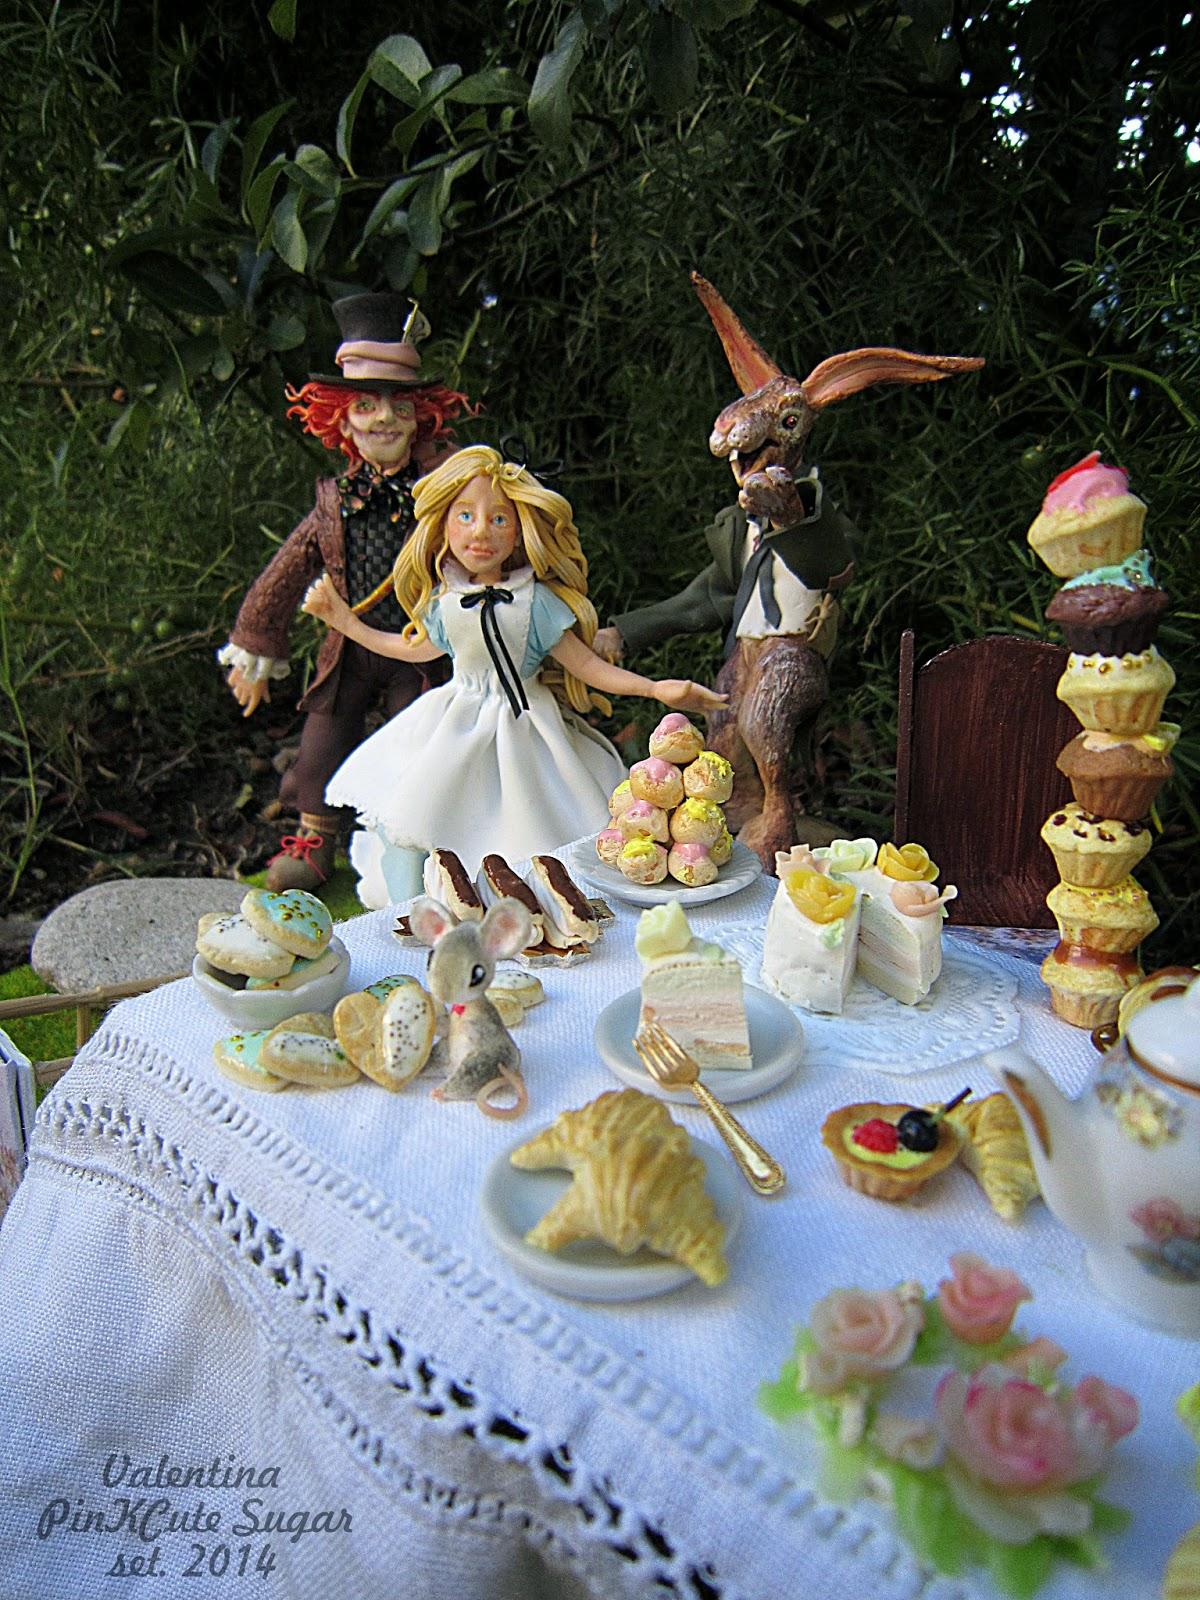 alice in wonderland fimo handmade miniaturefood alice in wonderland party valentina gaia manzo pinkcute sugar (56)